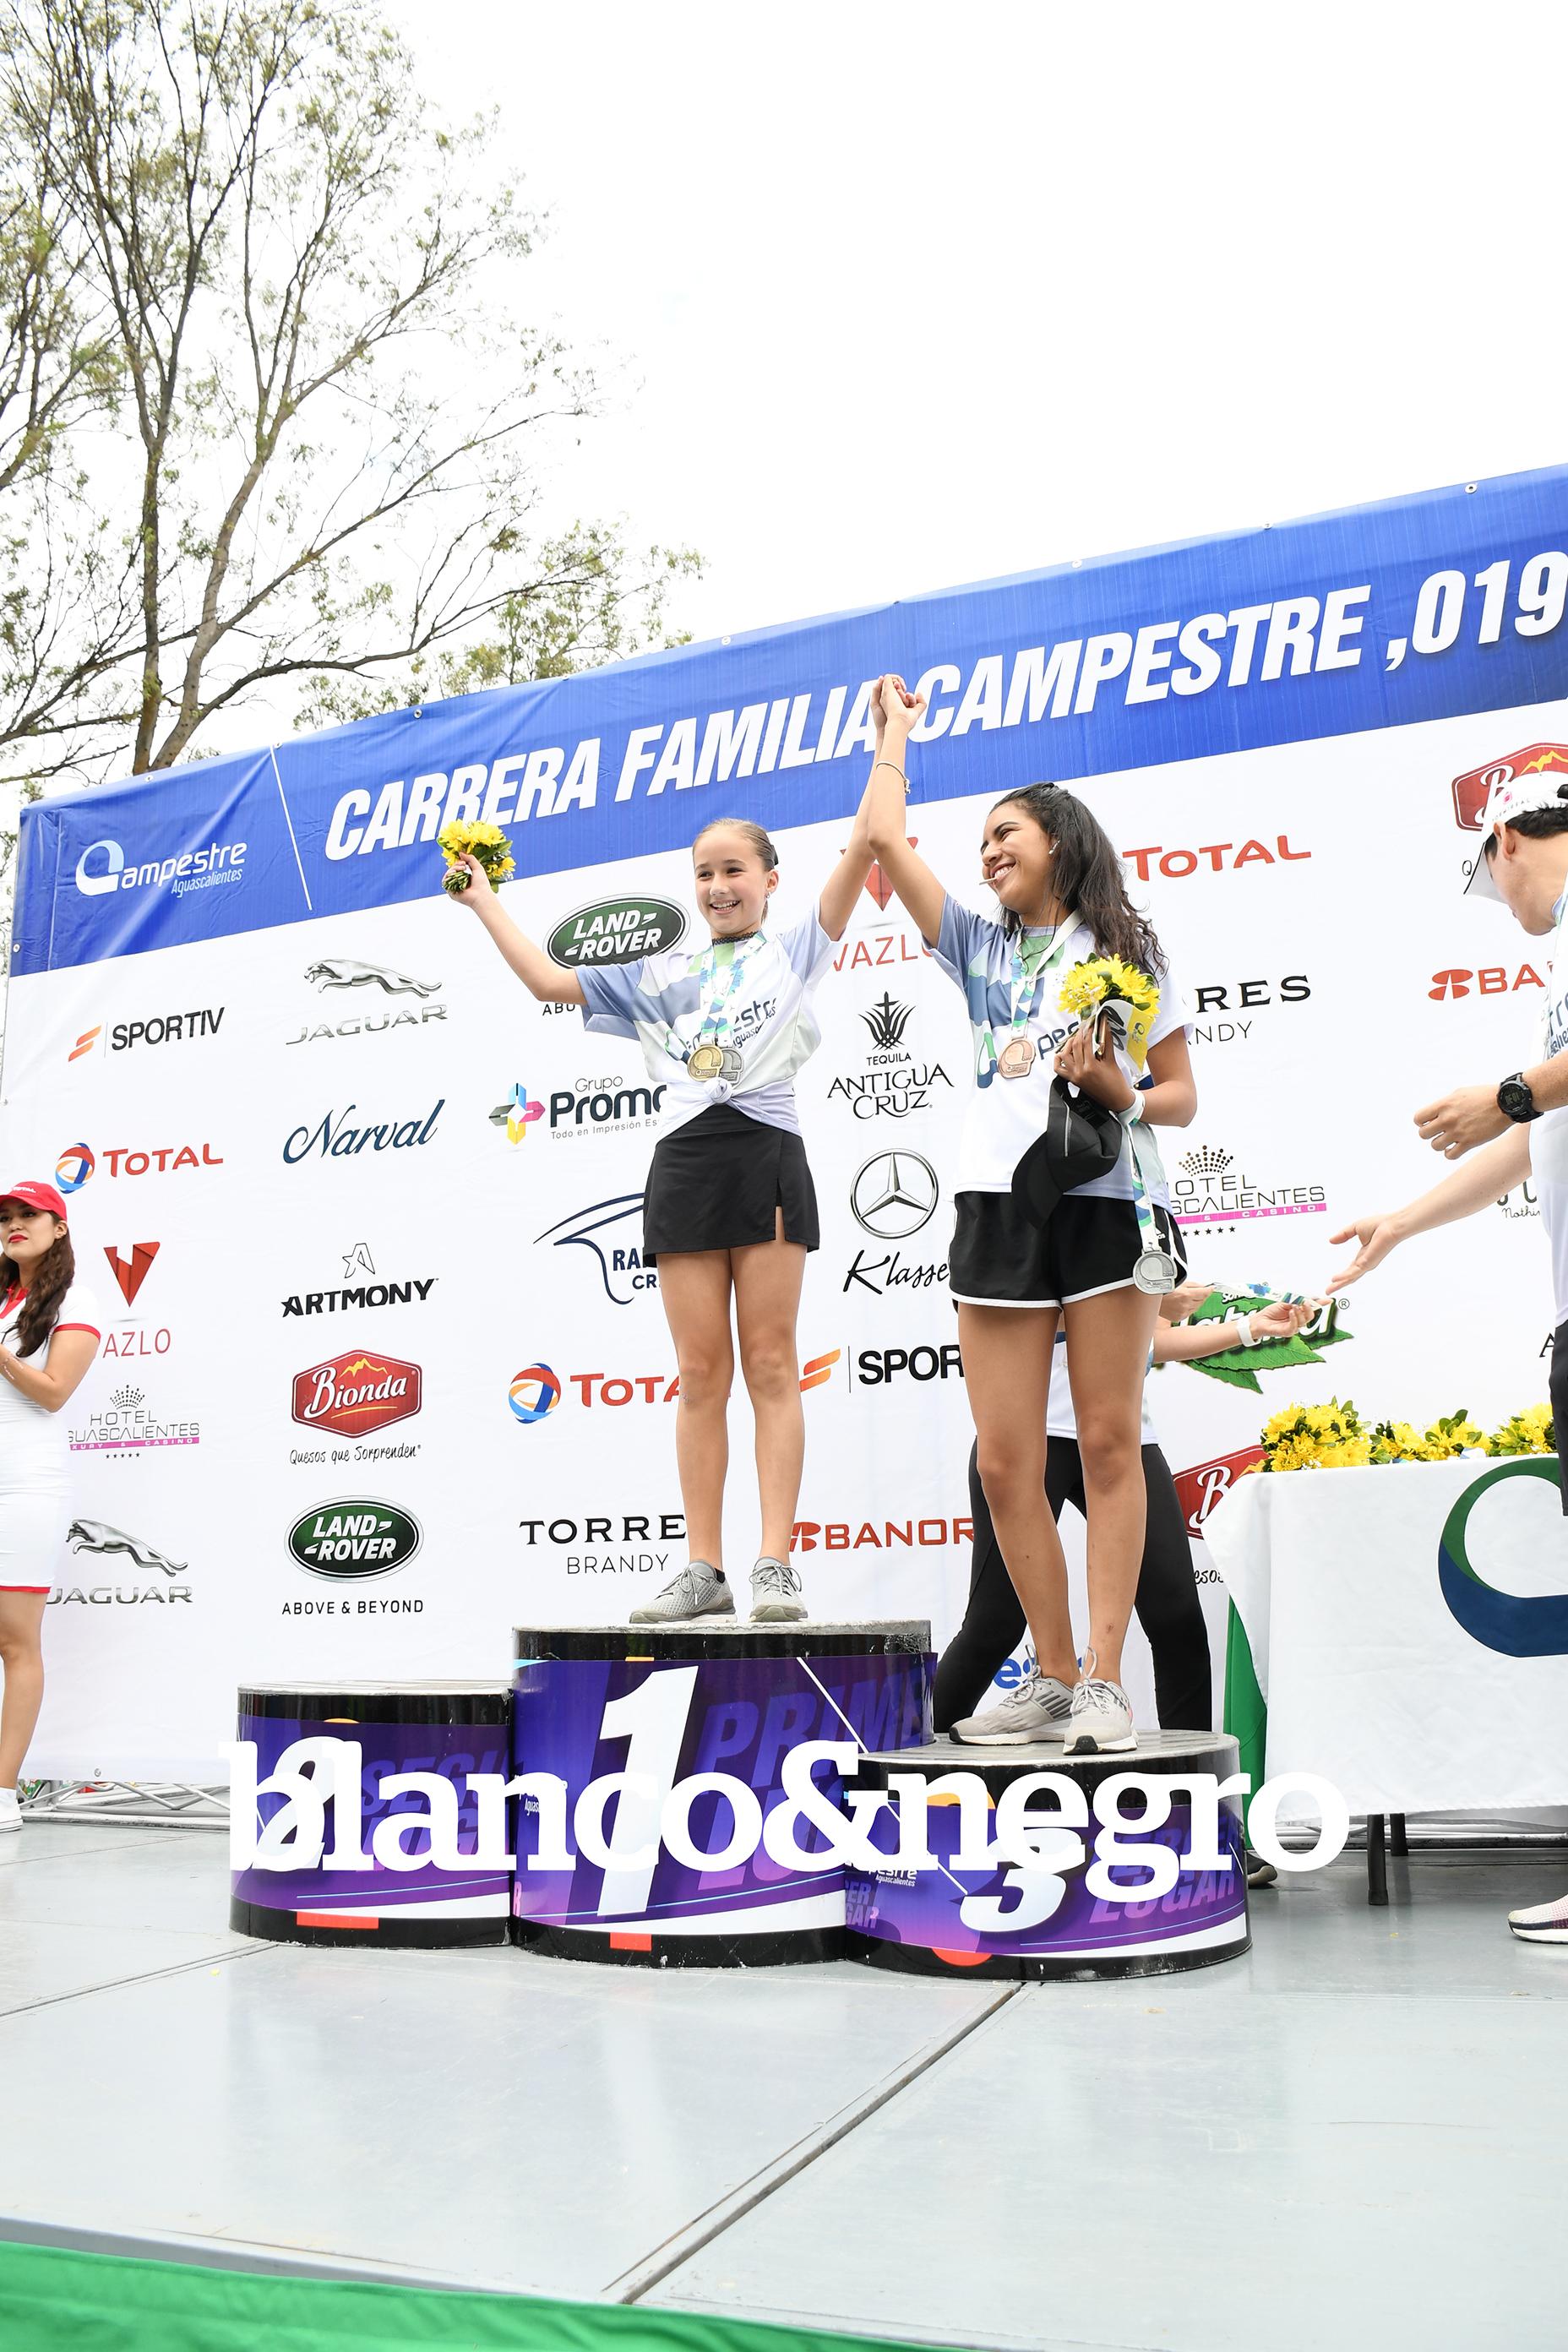 Carrera Campestre 381